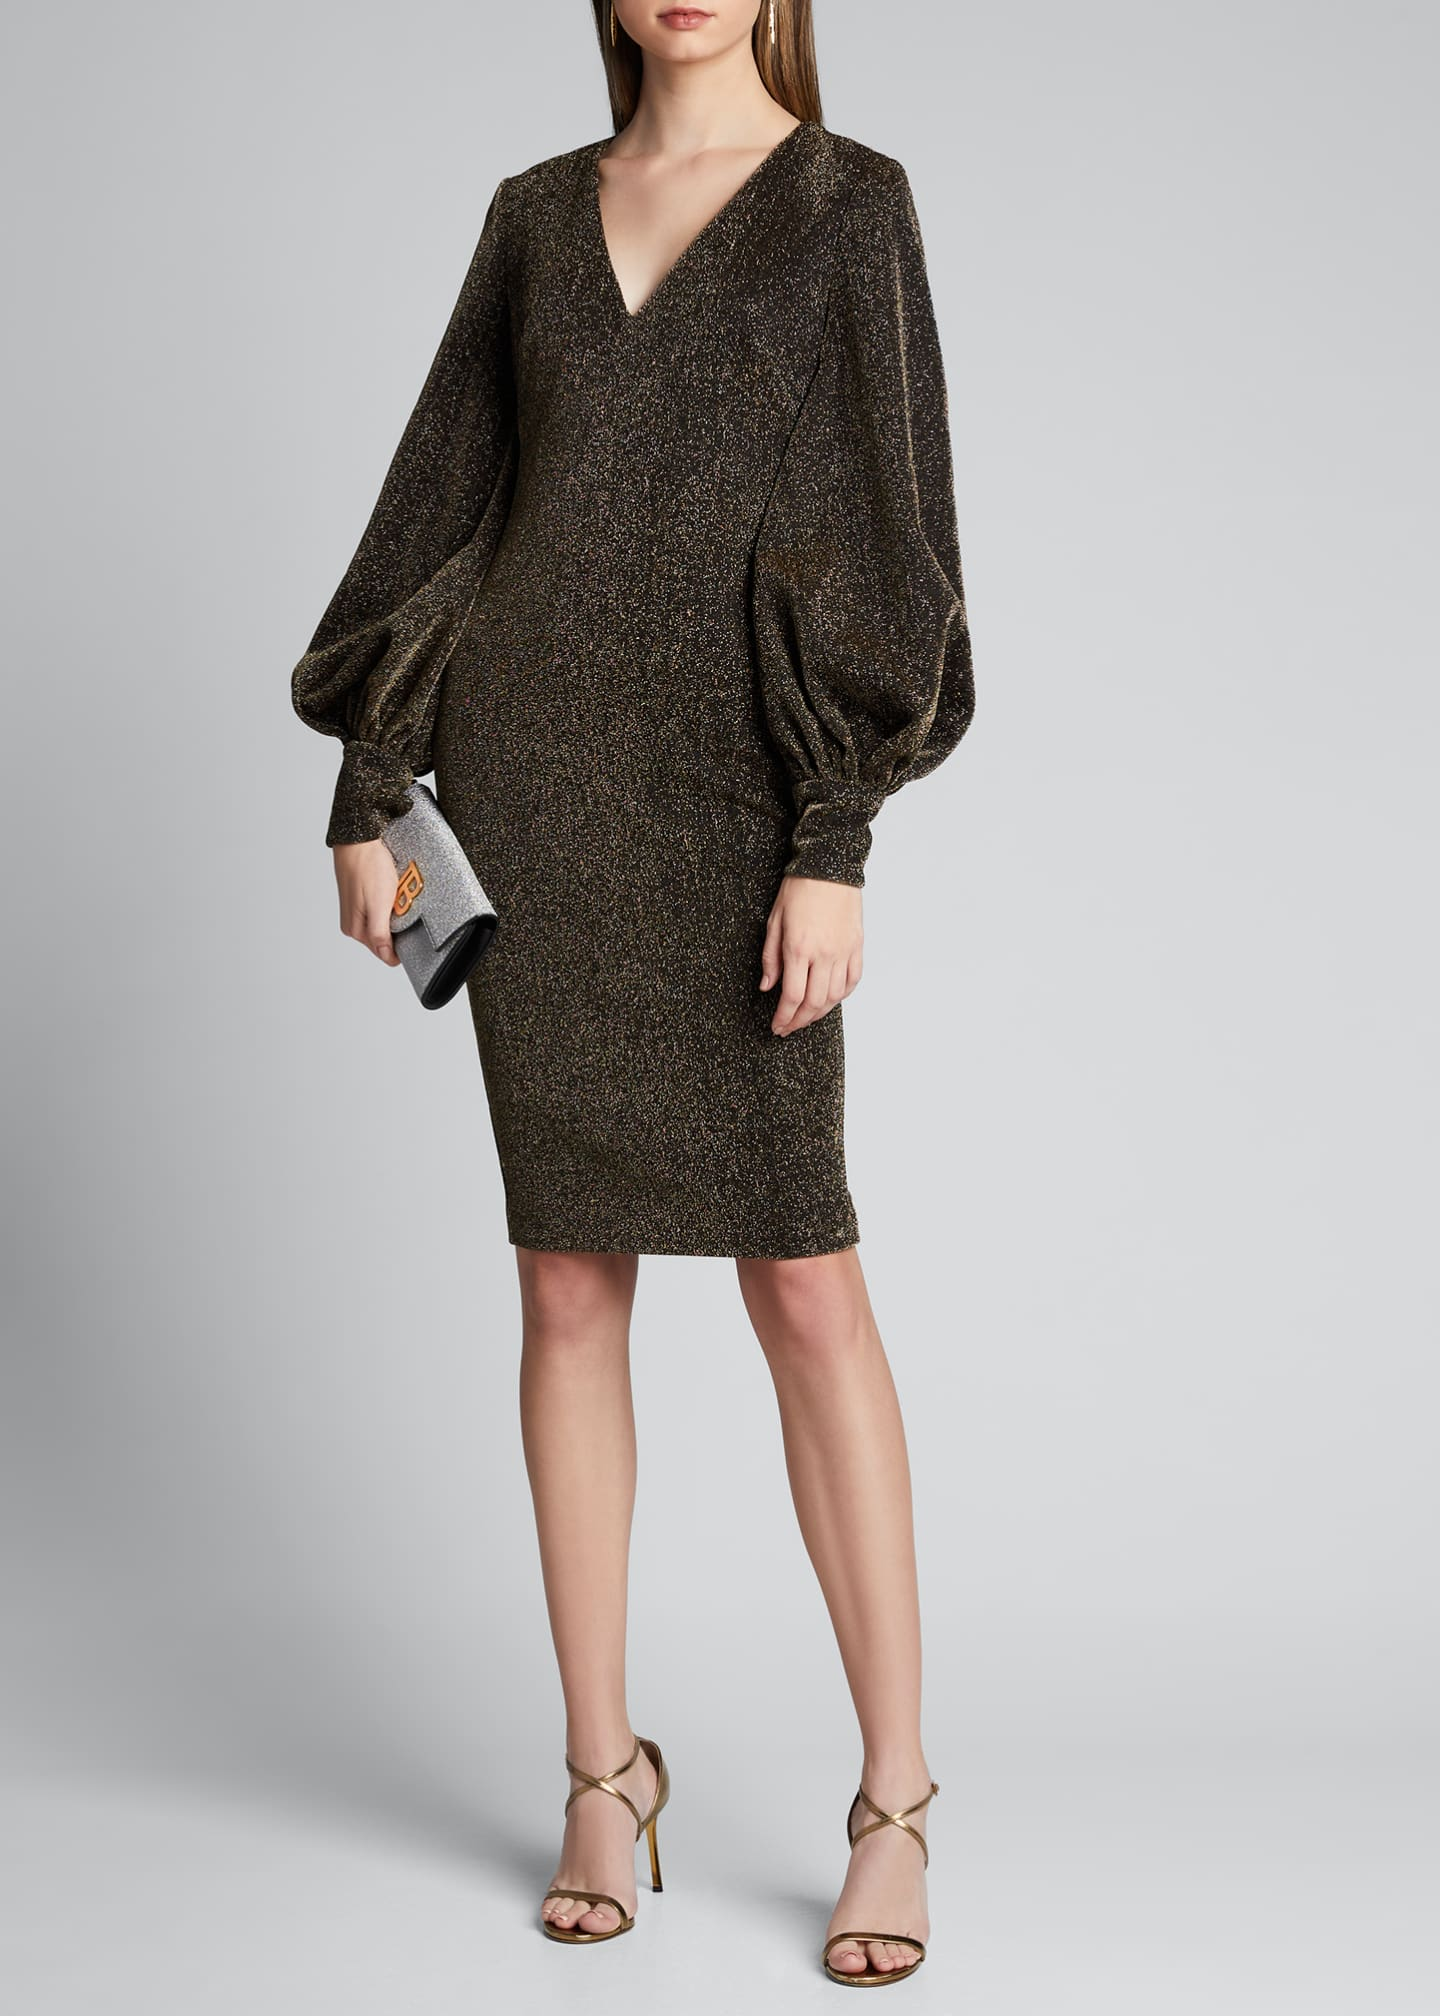 Badgley Mischka Collection Metallic Shimmer Knit V-Neck